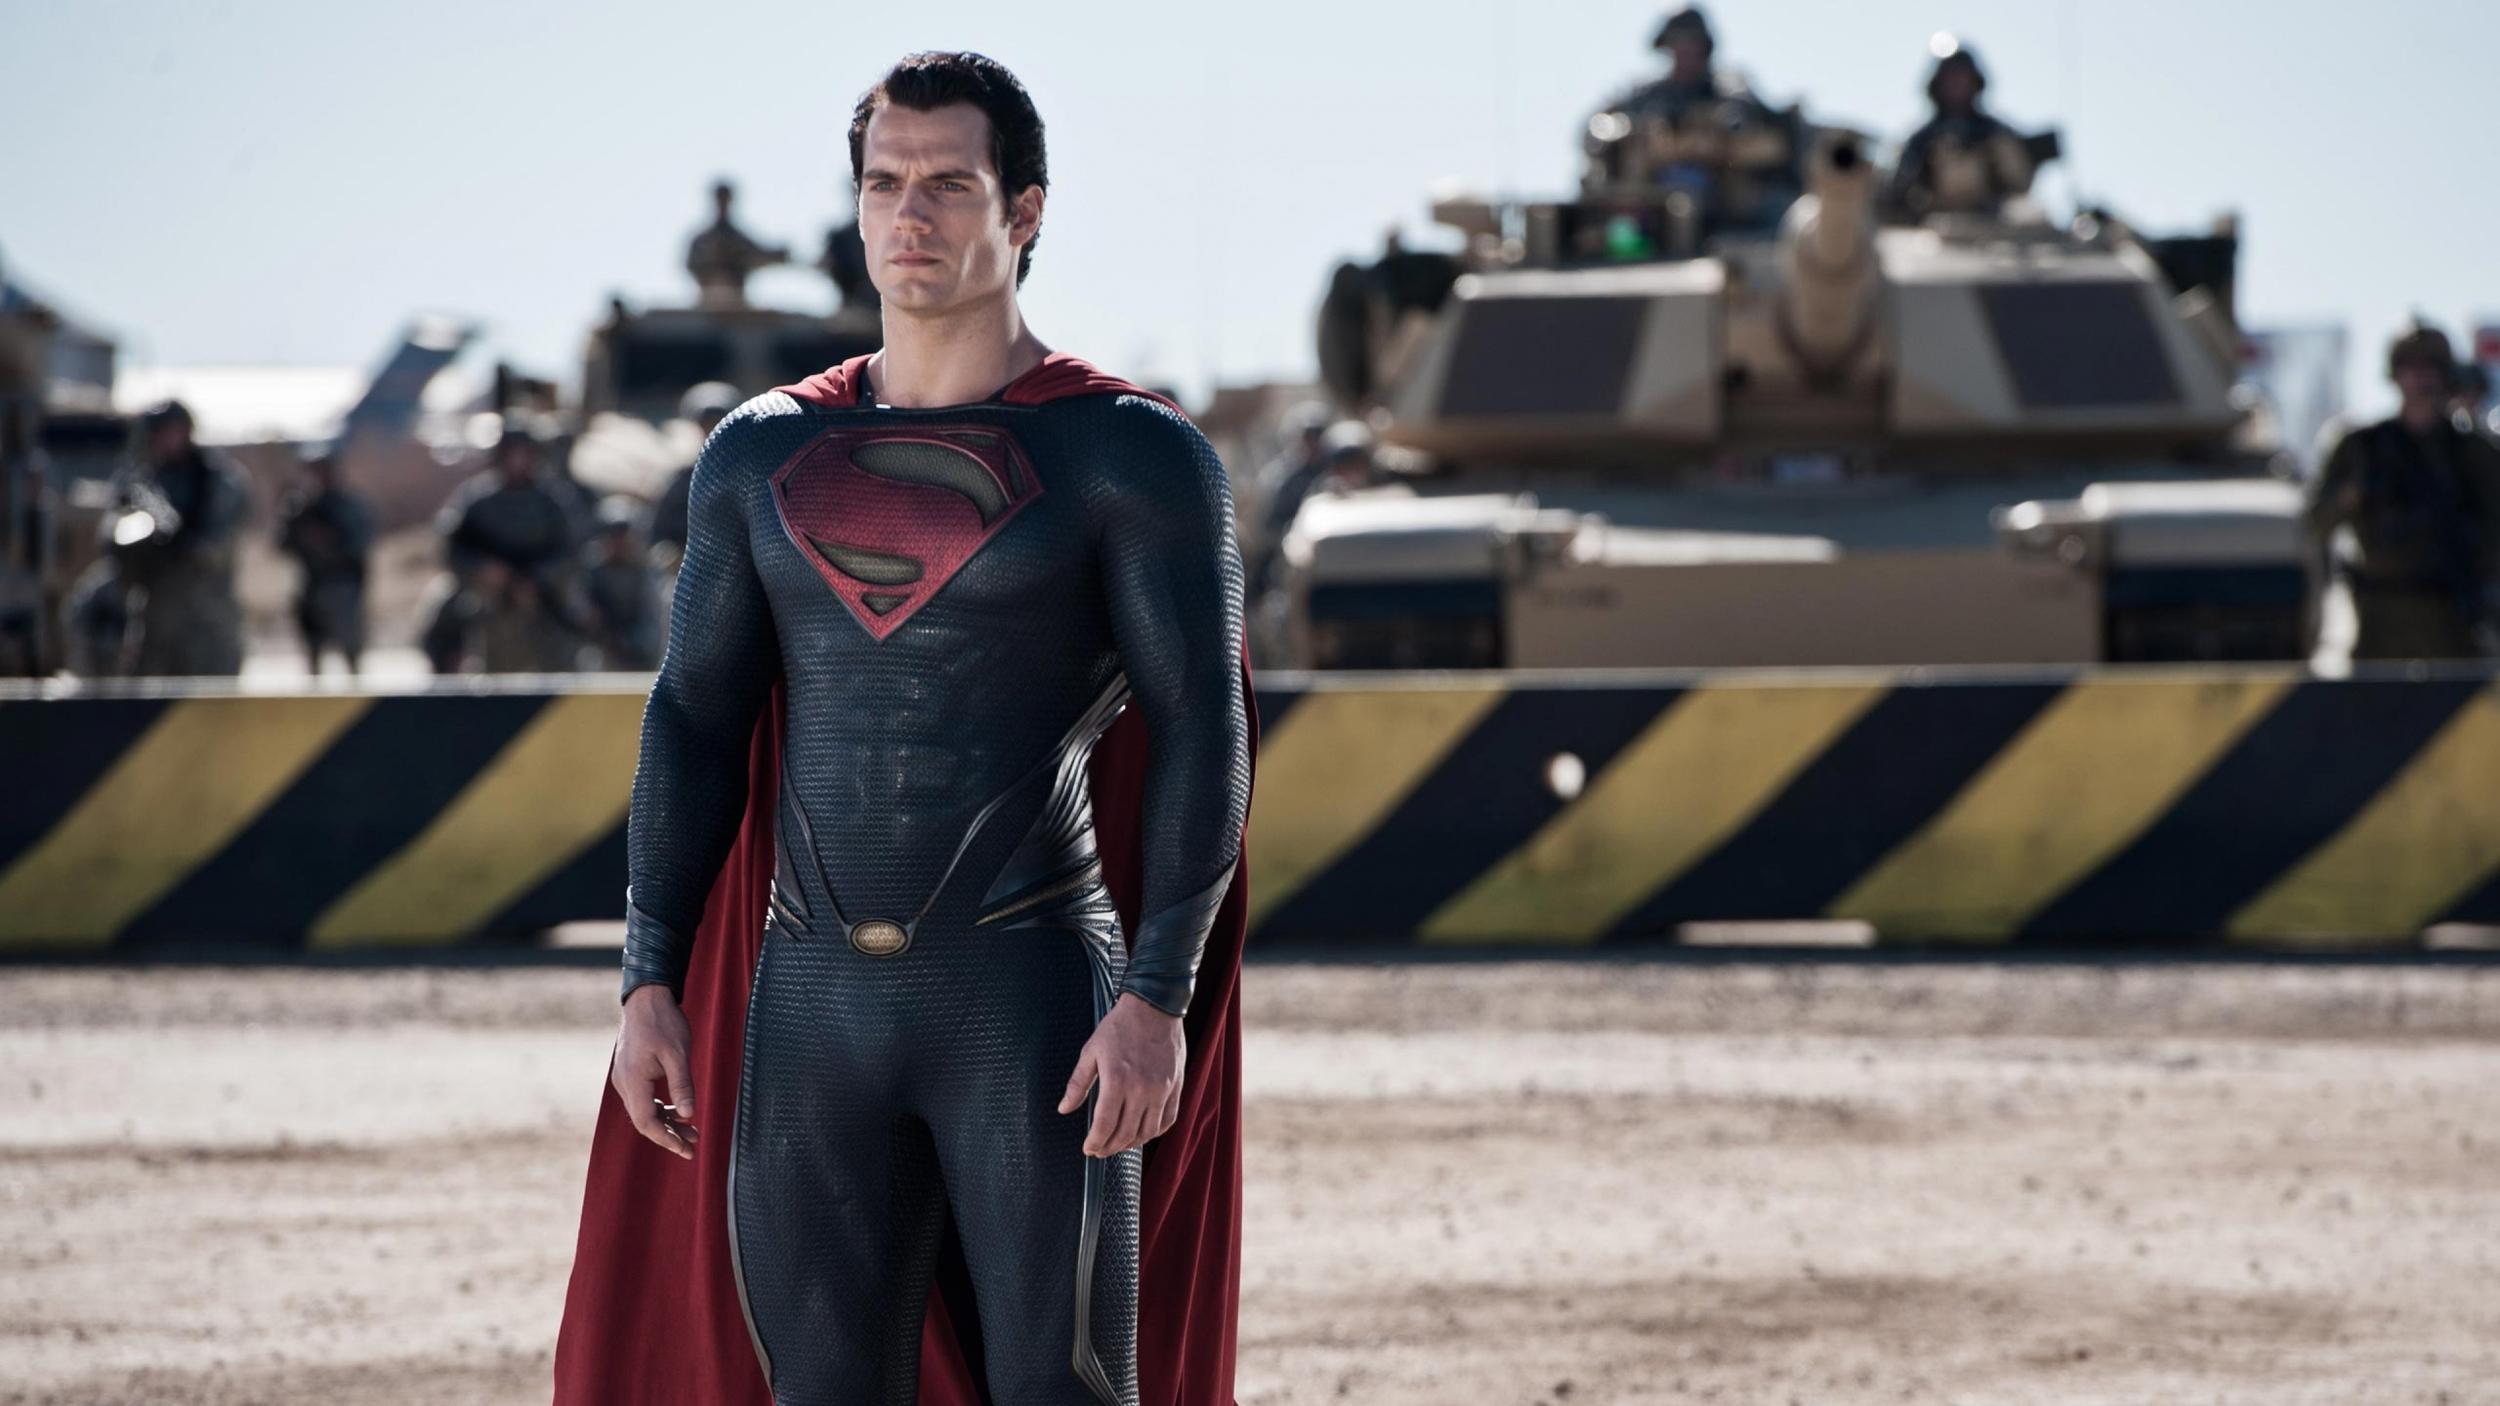 man_of_steel_superman_henry_cavill_clark_kent_93960_3840x2160.jpg